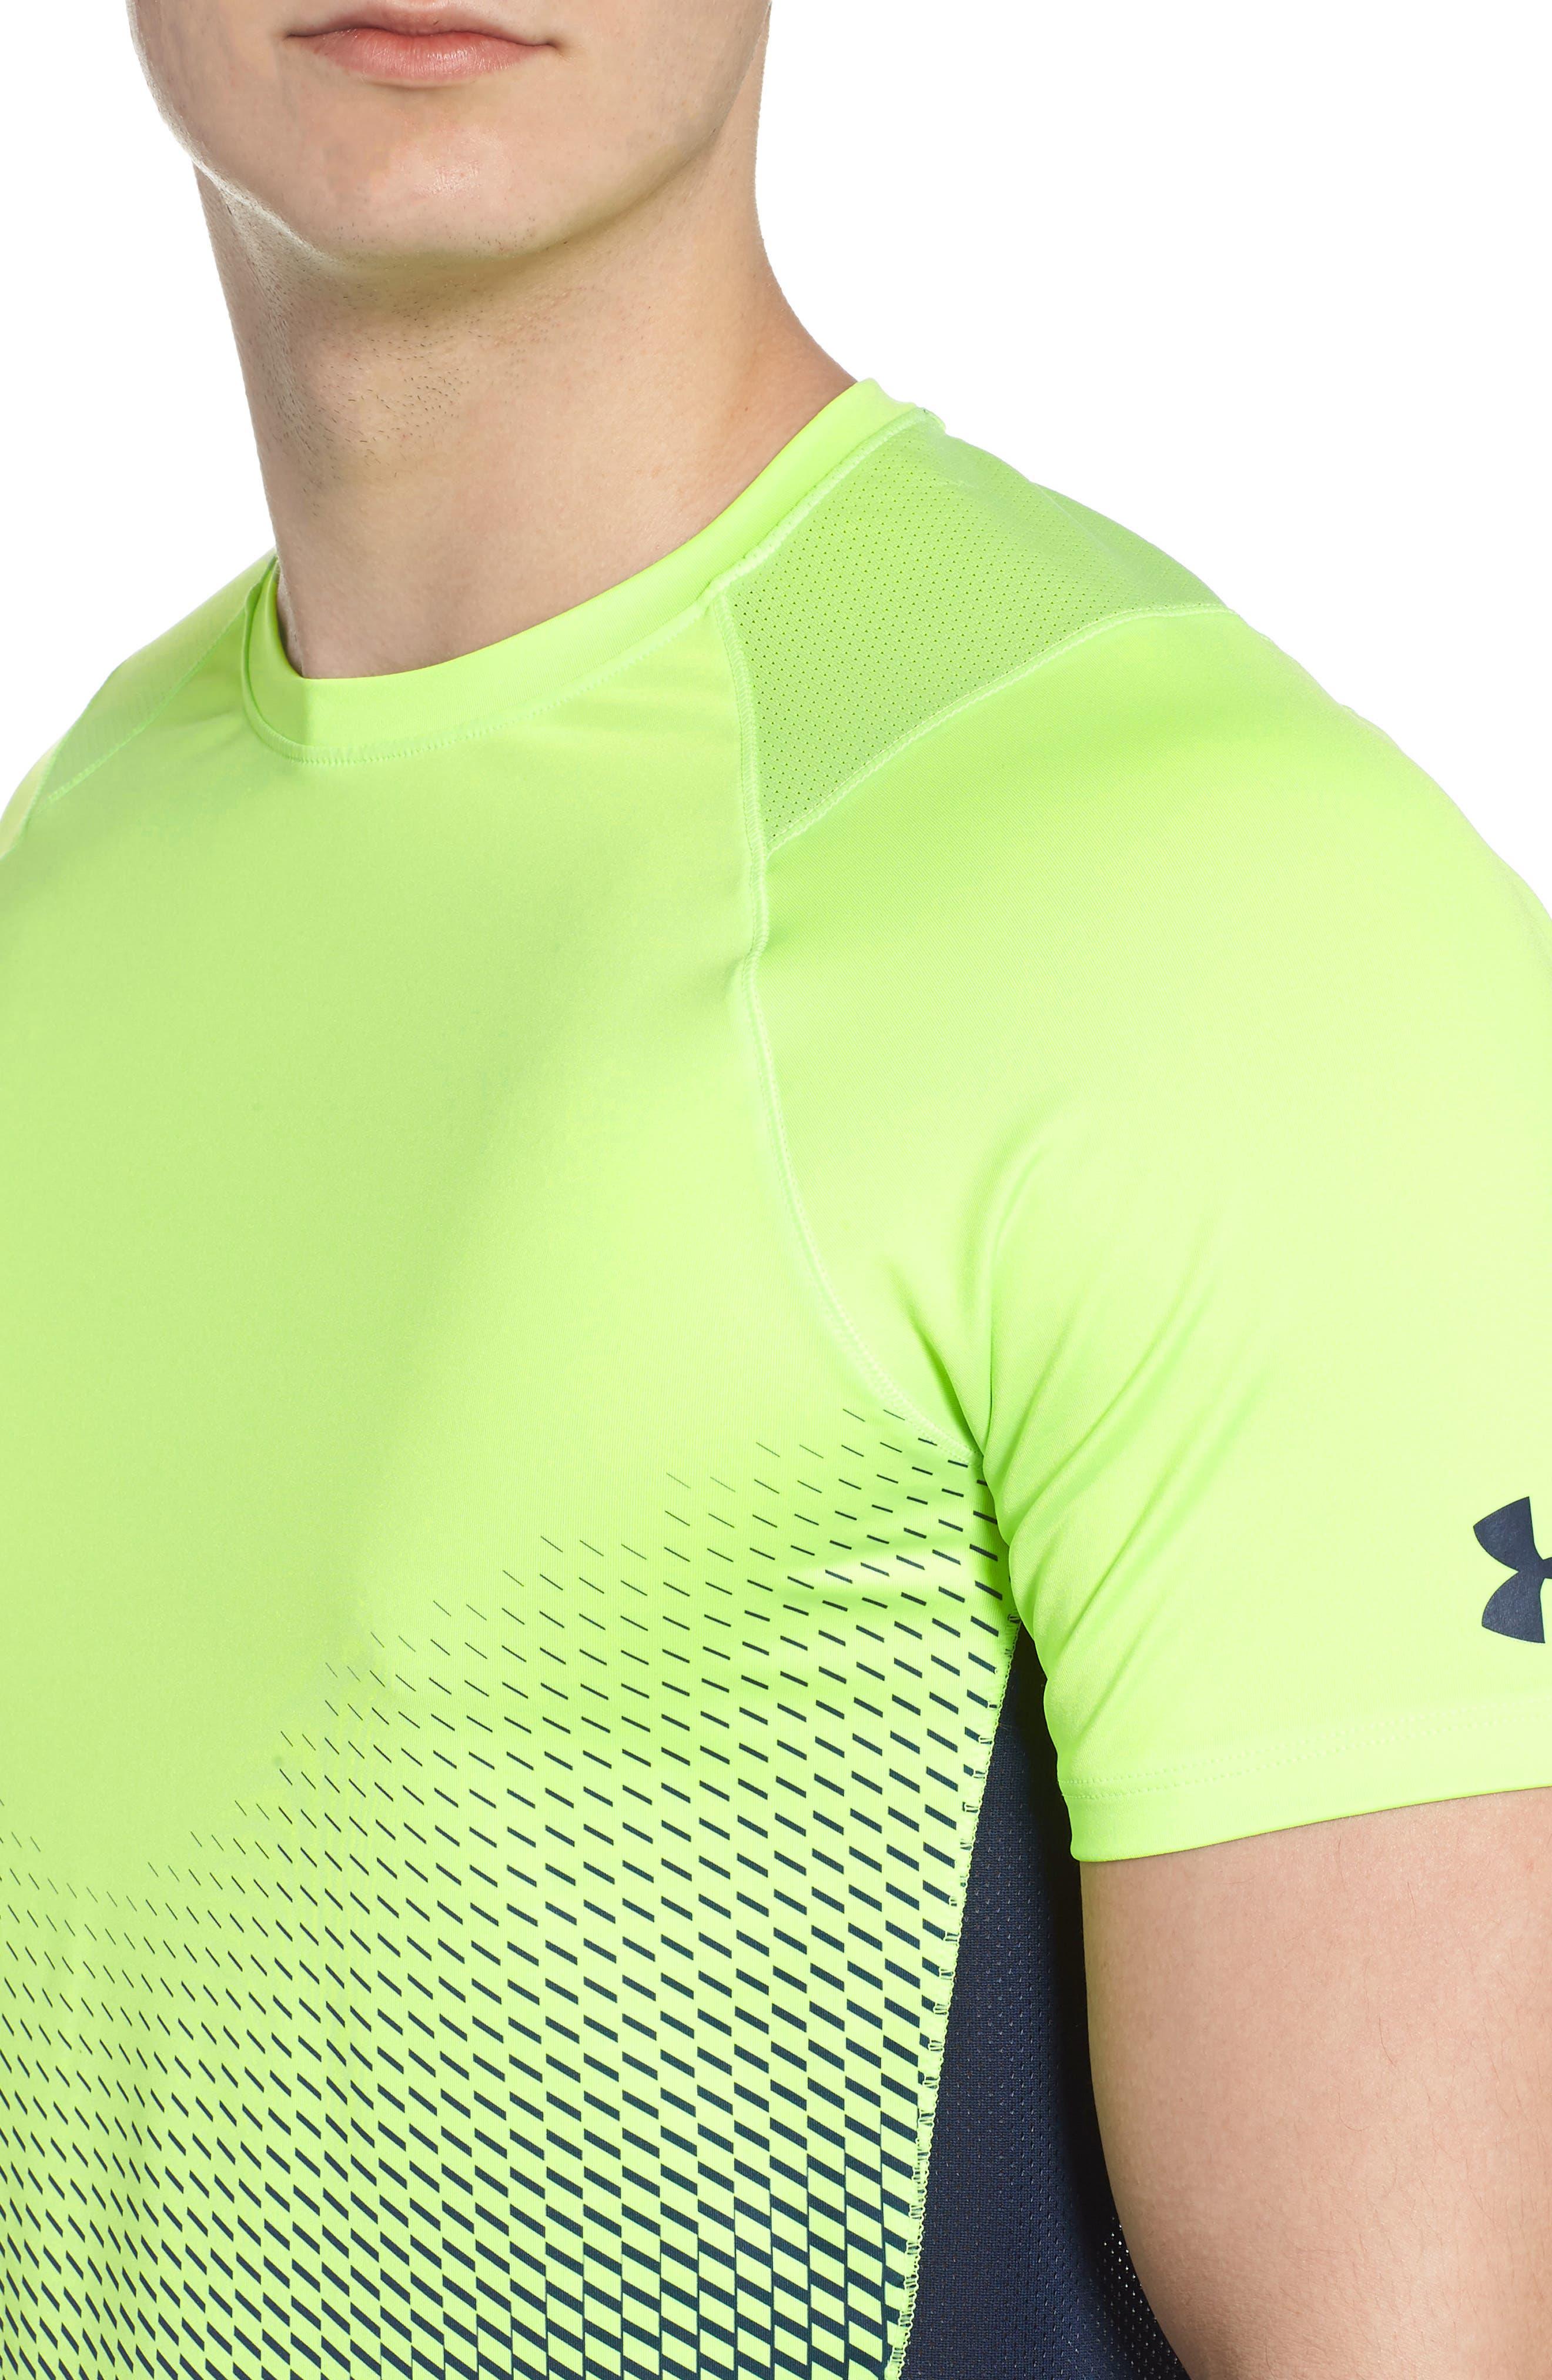 MK1 Dash Crewneck T-Shirt,                             Alternate thumbnail 4, color,                             Lime / Academy / Graphite